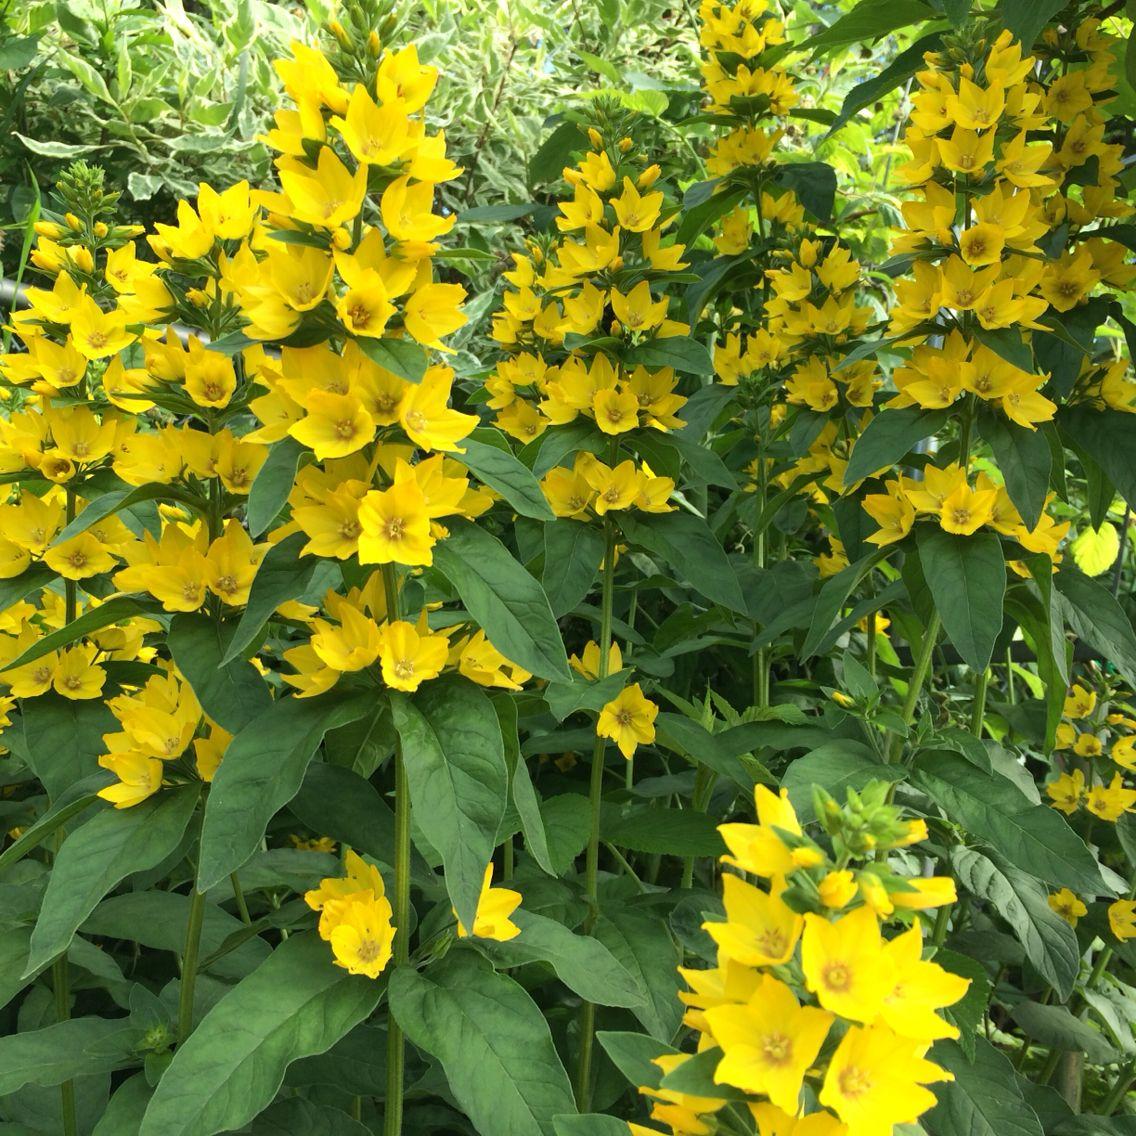 Yellow spiky from my garden hoa s pinterest gardens and flowers yellow spiky from my garden mightylinksfo Gallery